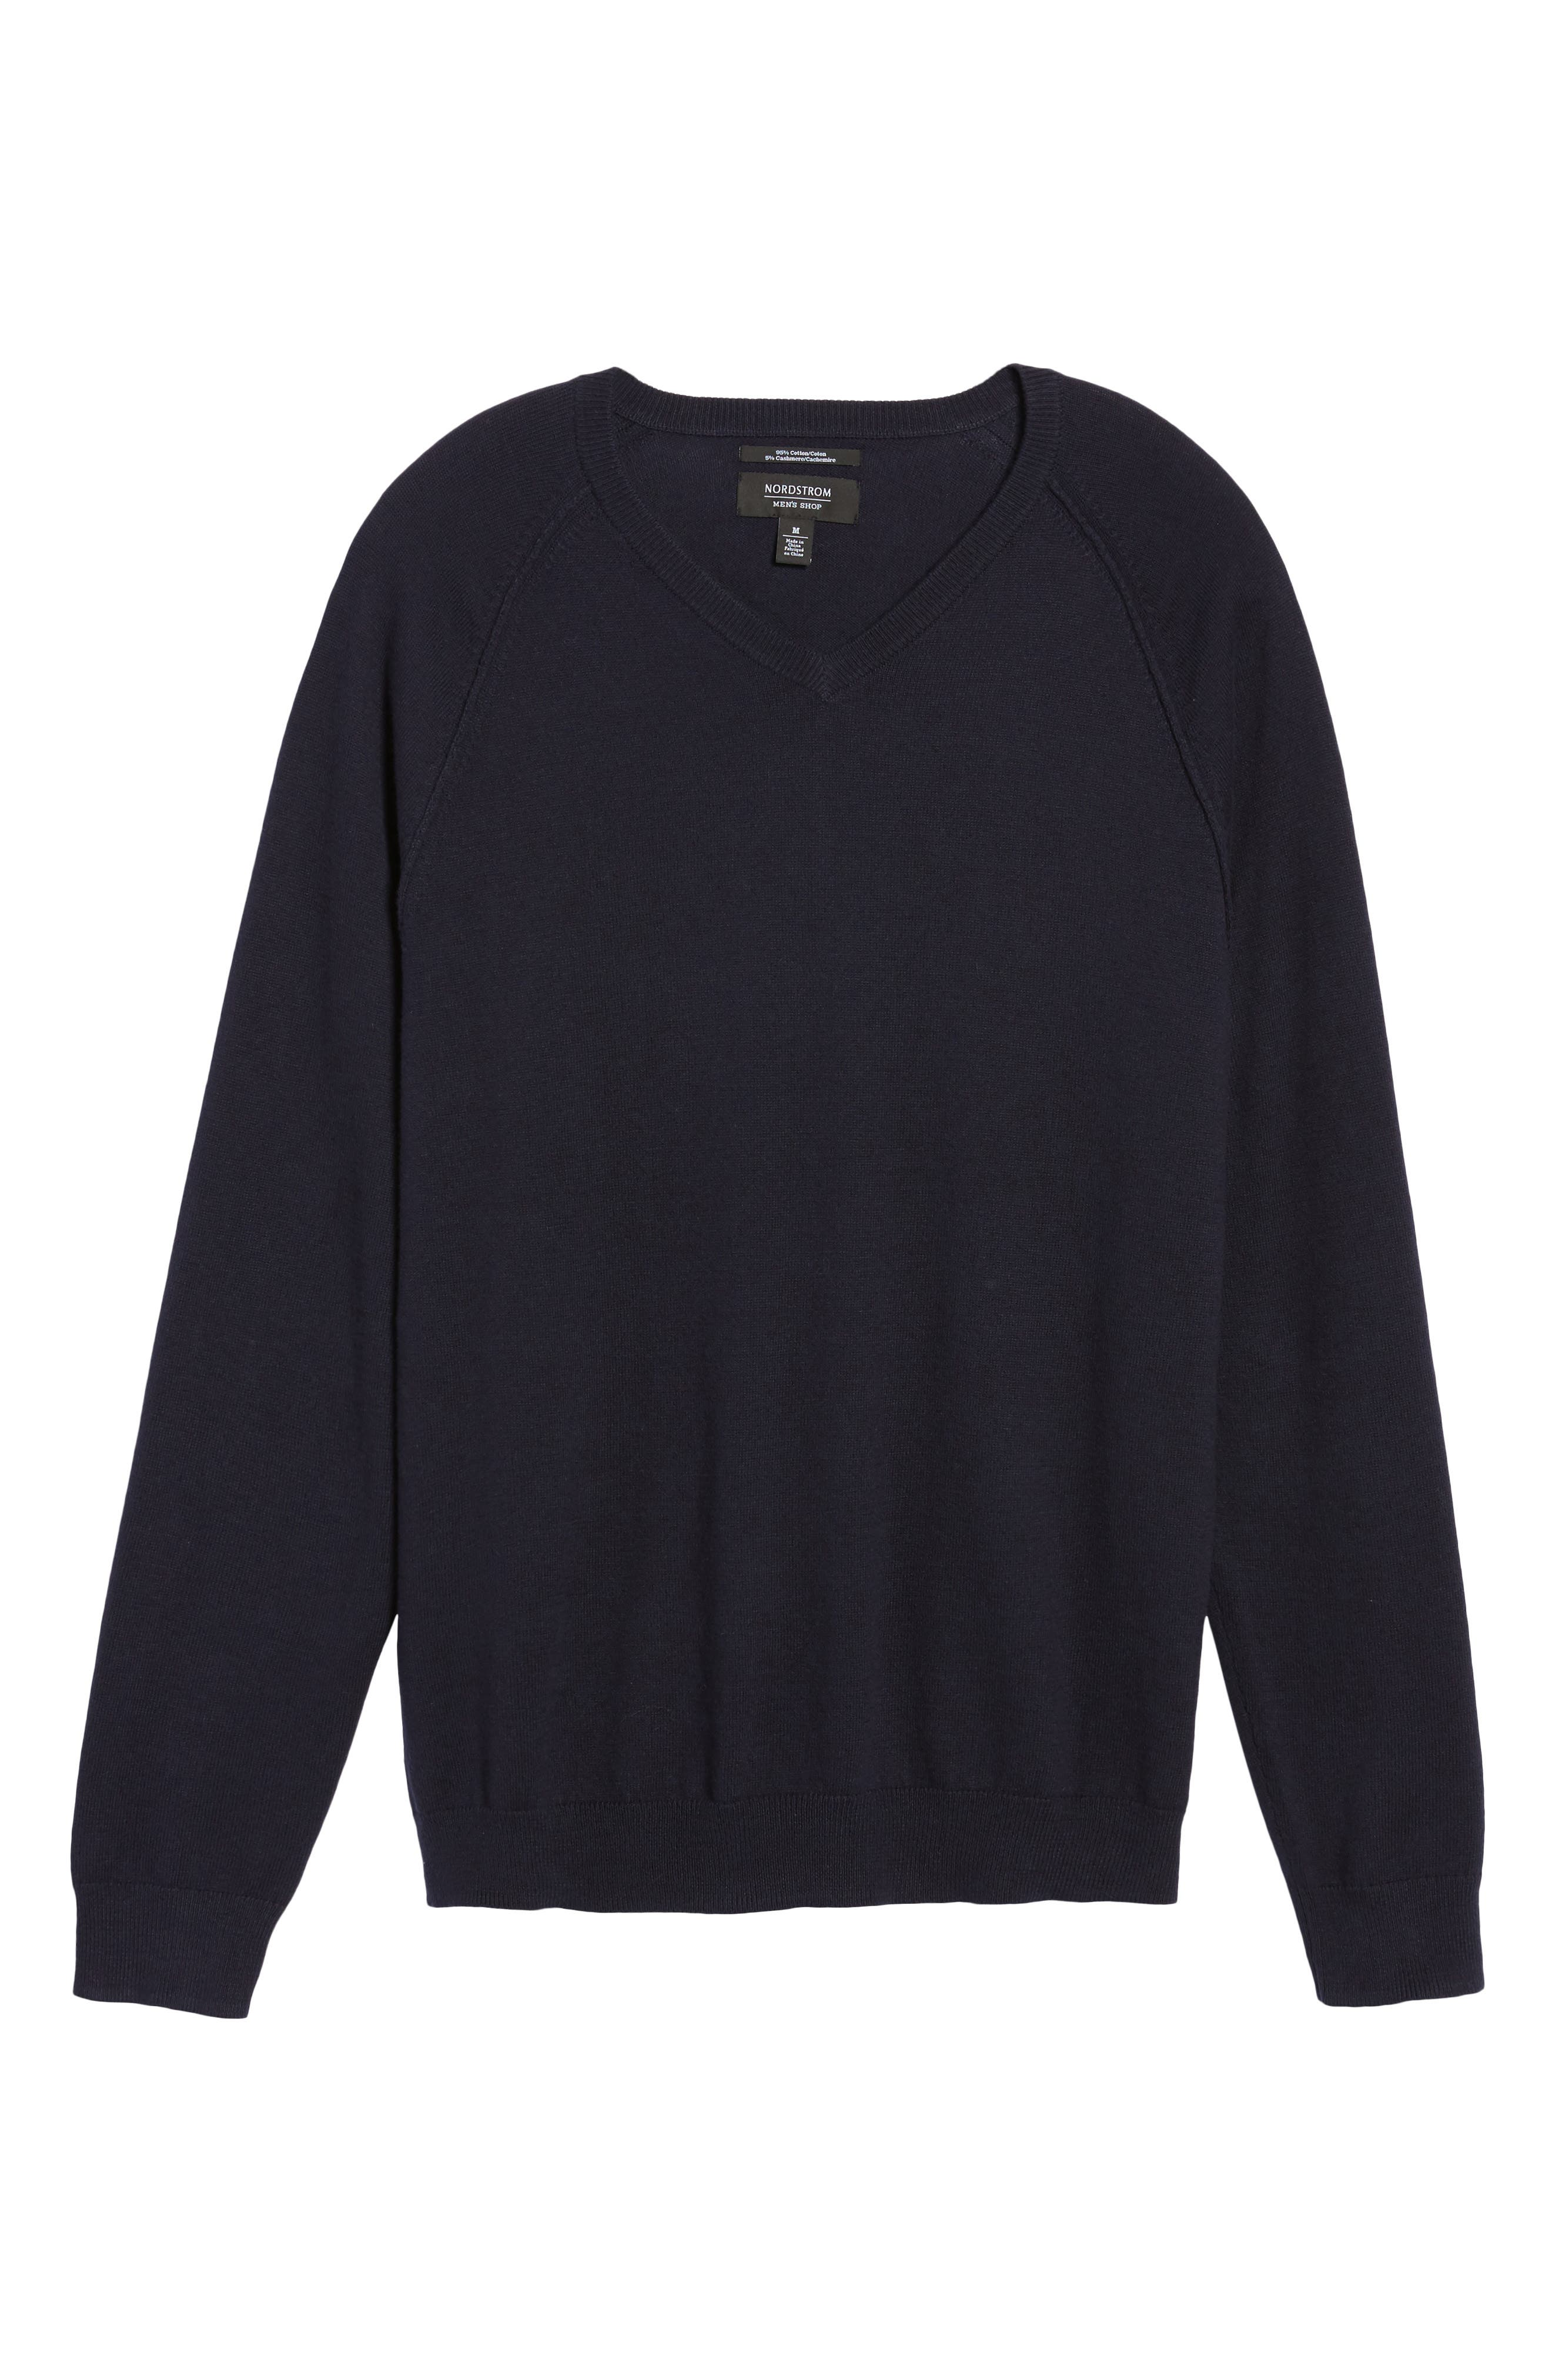 Saddle Shoulder Cotton & Cashmere V-Neck Sweater,                             Alternate thumbnail 6, color,                             Navy Night